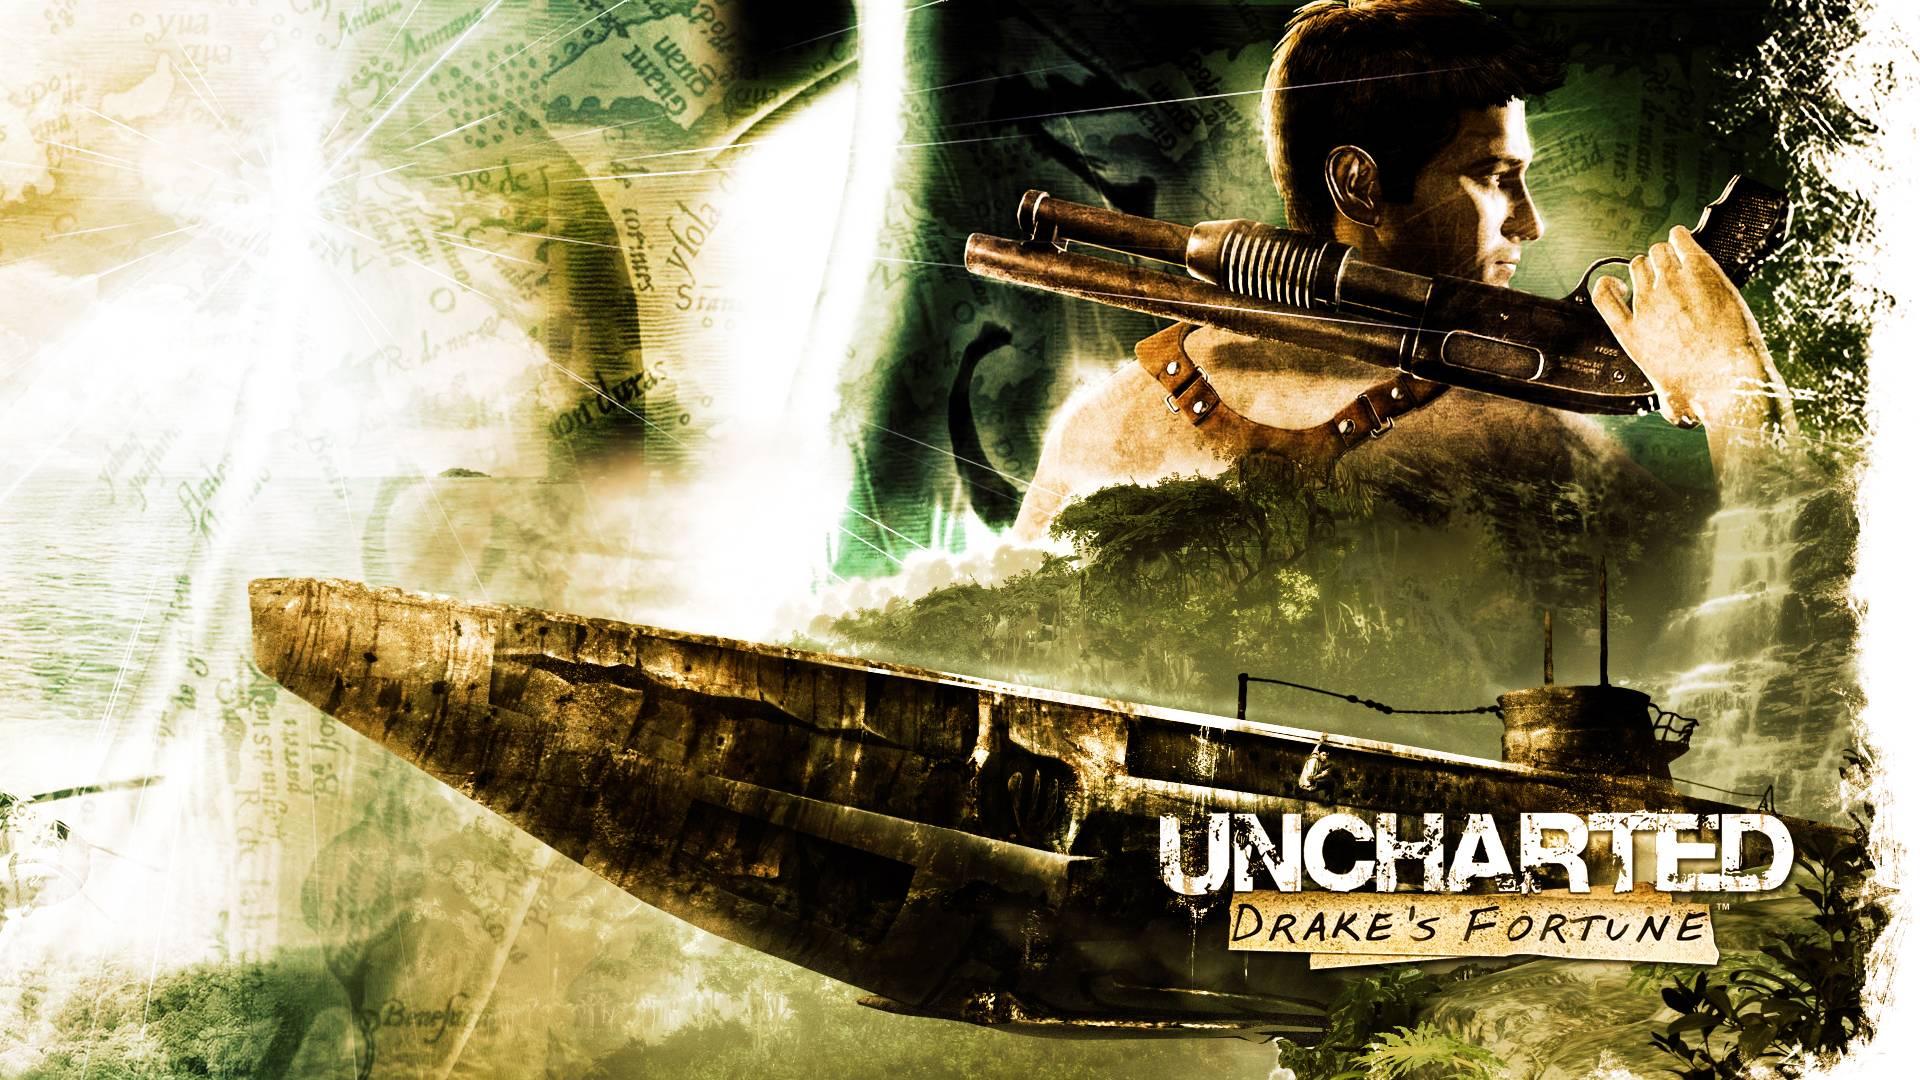 Uncharted - Drake Posing Wallpaper